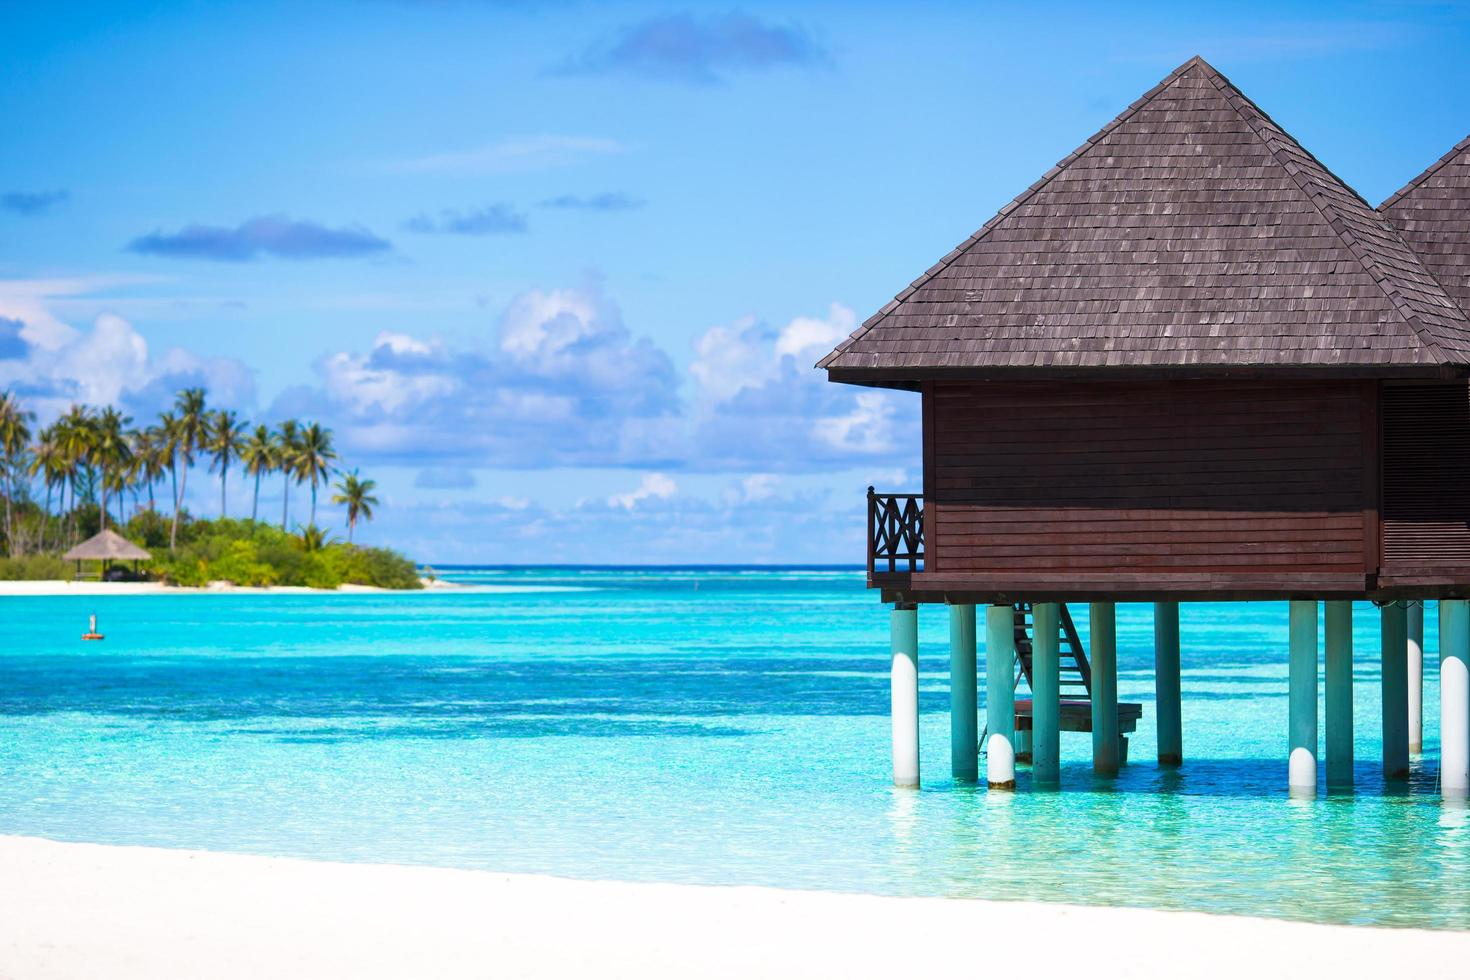 Maldivas, Asia del Sur, 2020 - bungalows de agua en agua azul foto